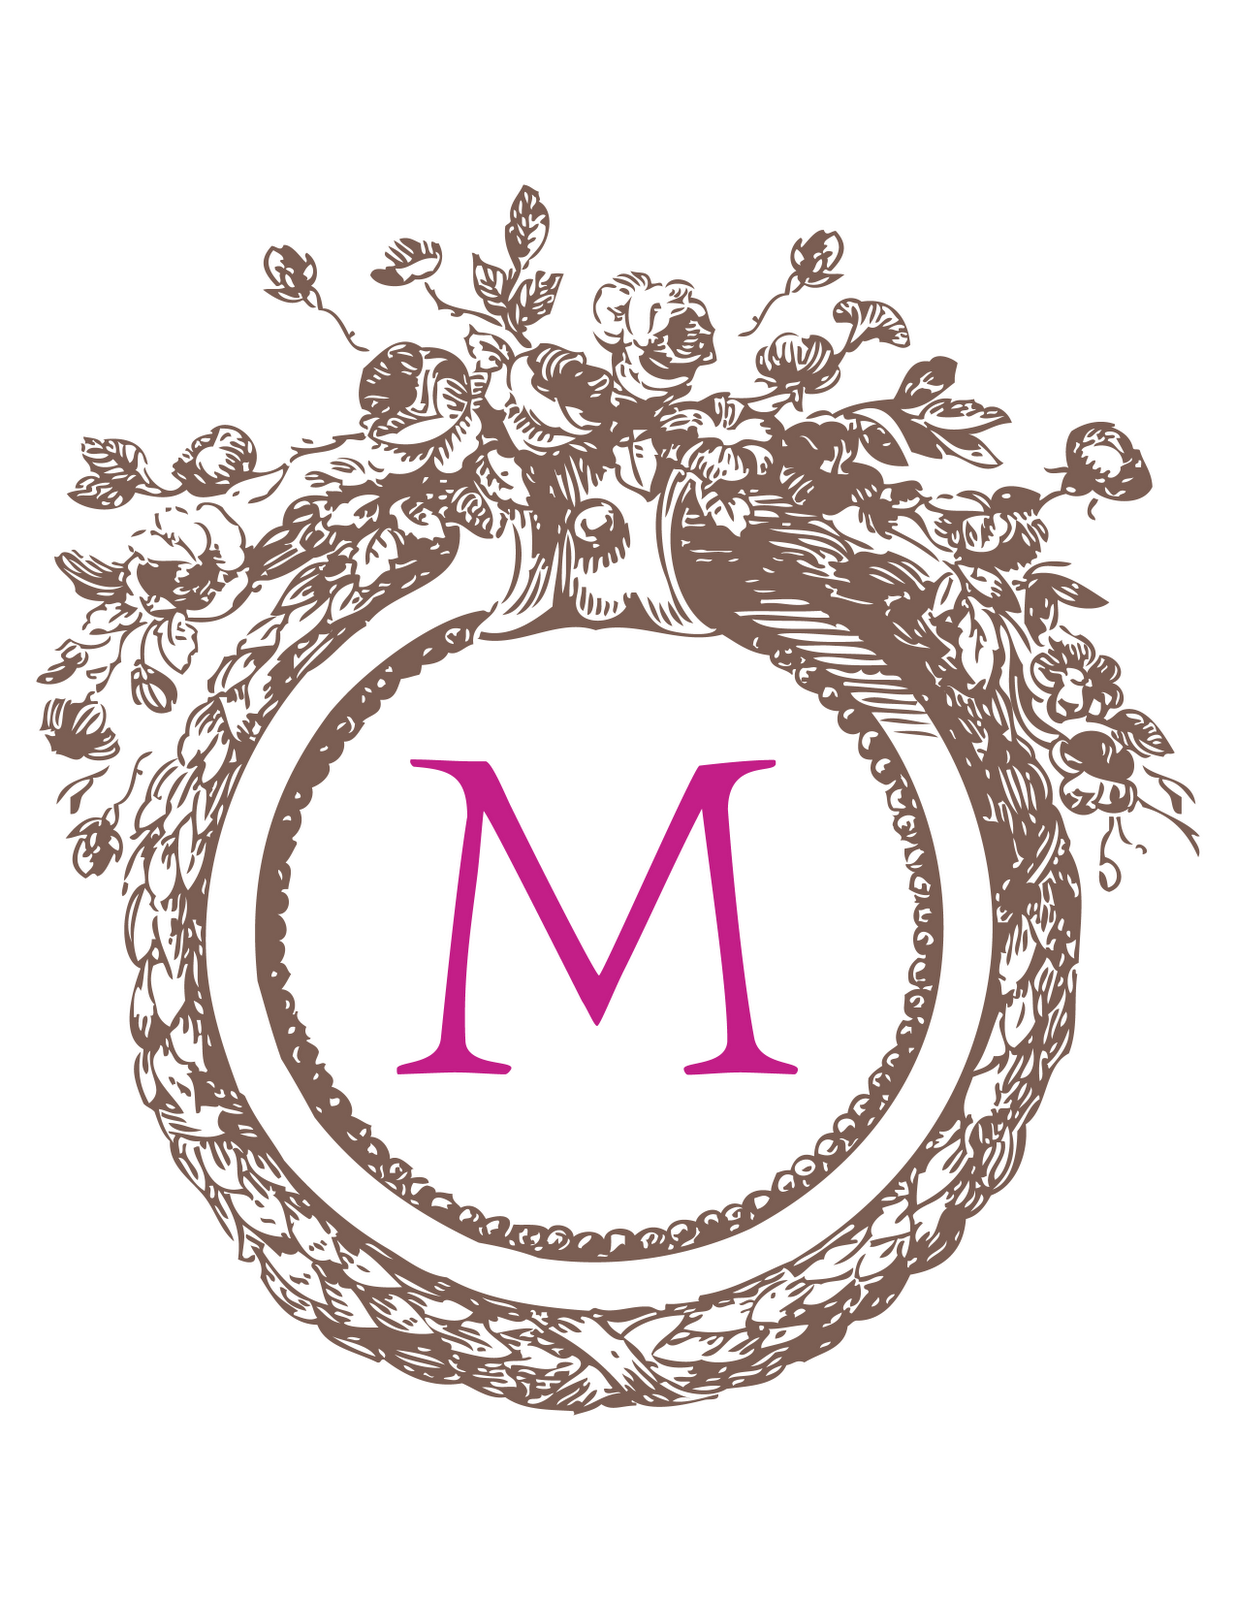 found these custom monograms through The Thriftary s blog 1236x1600